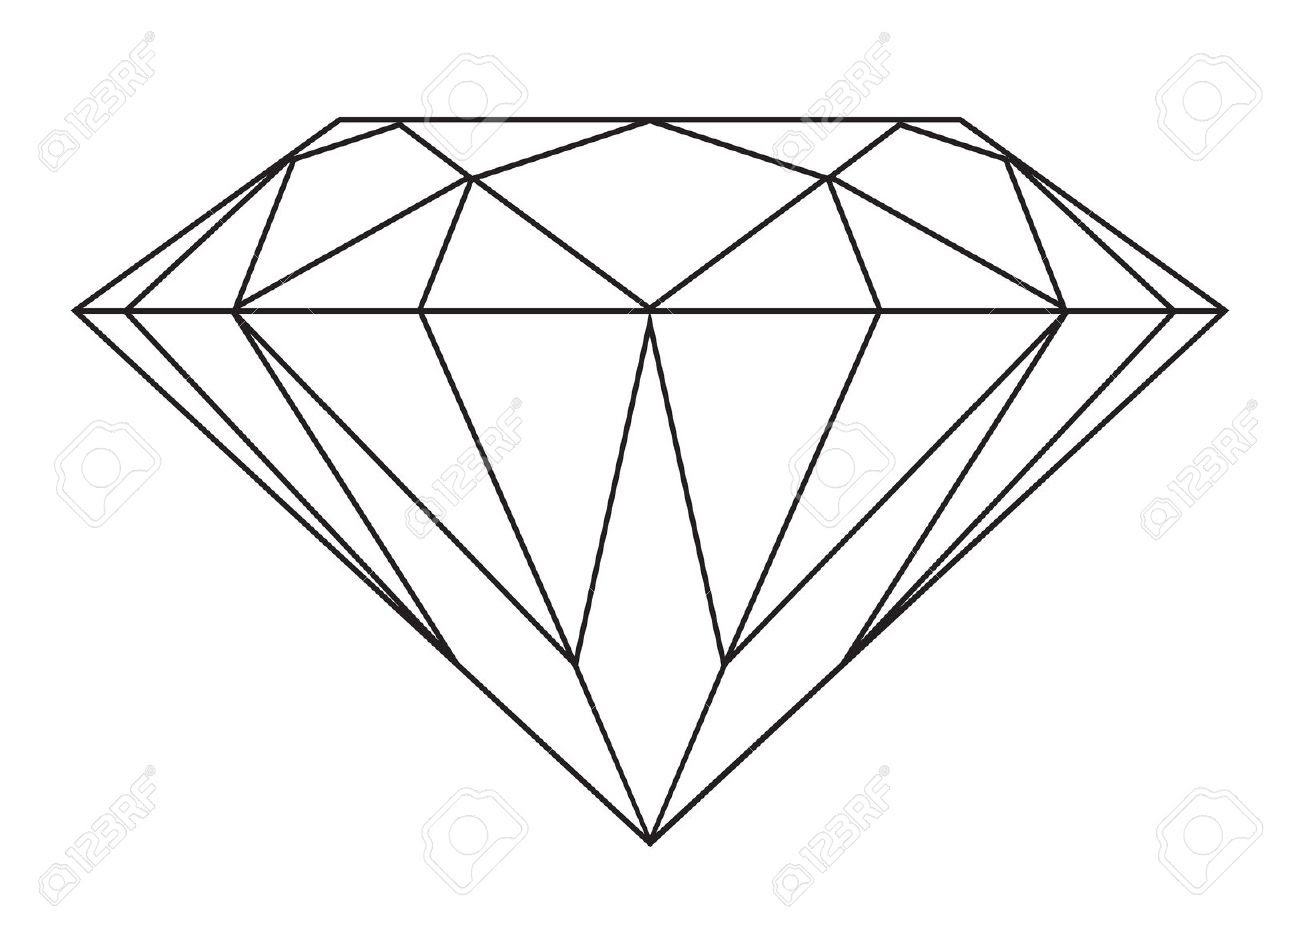 1300x925 Diamond Drawing Drawing A Diamond Drawing A Diamond